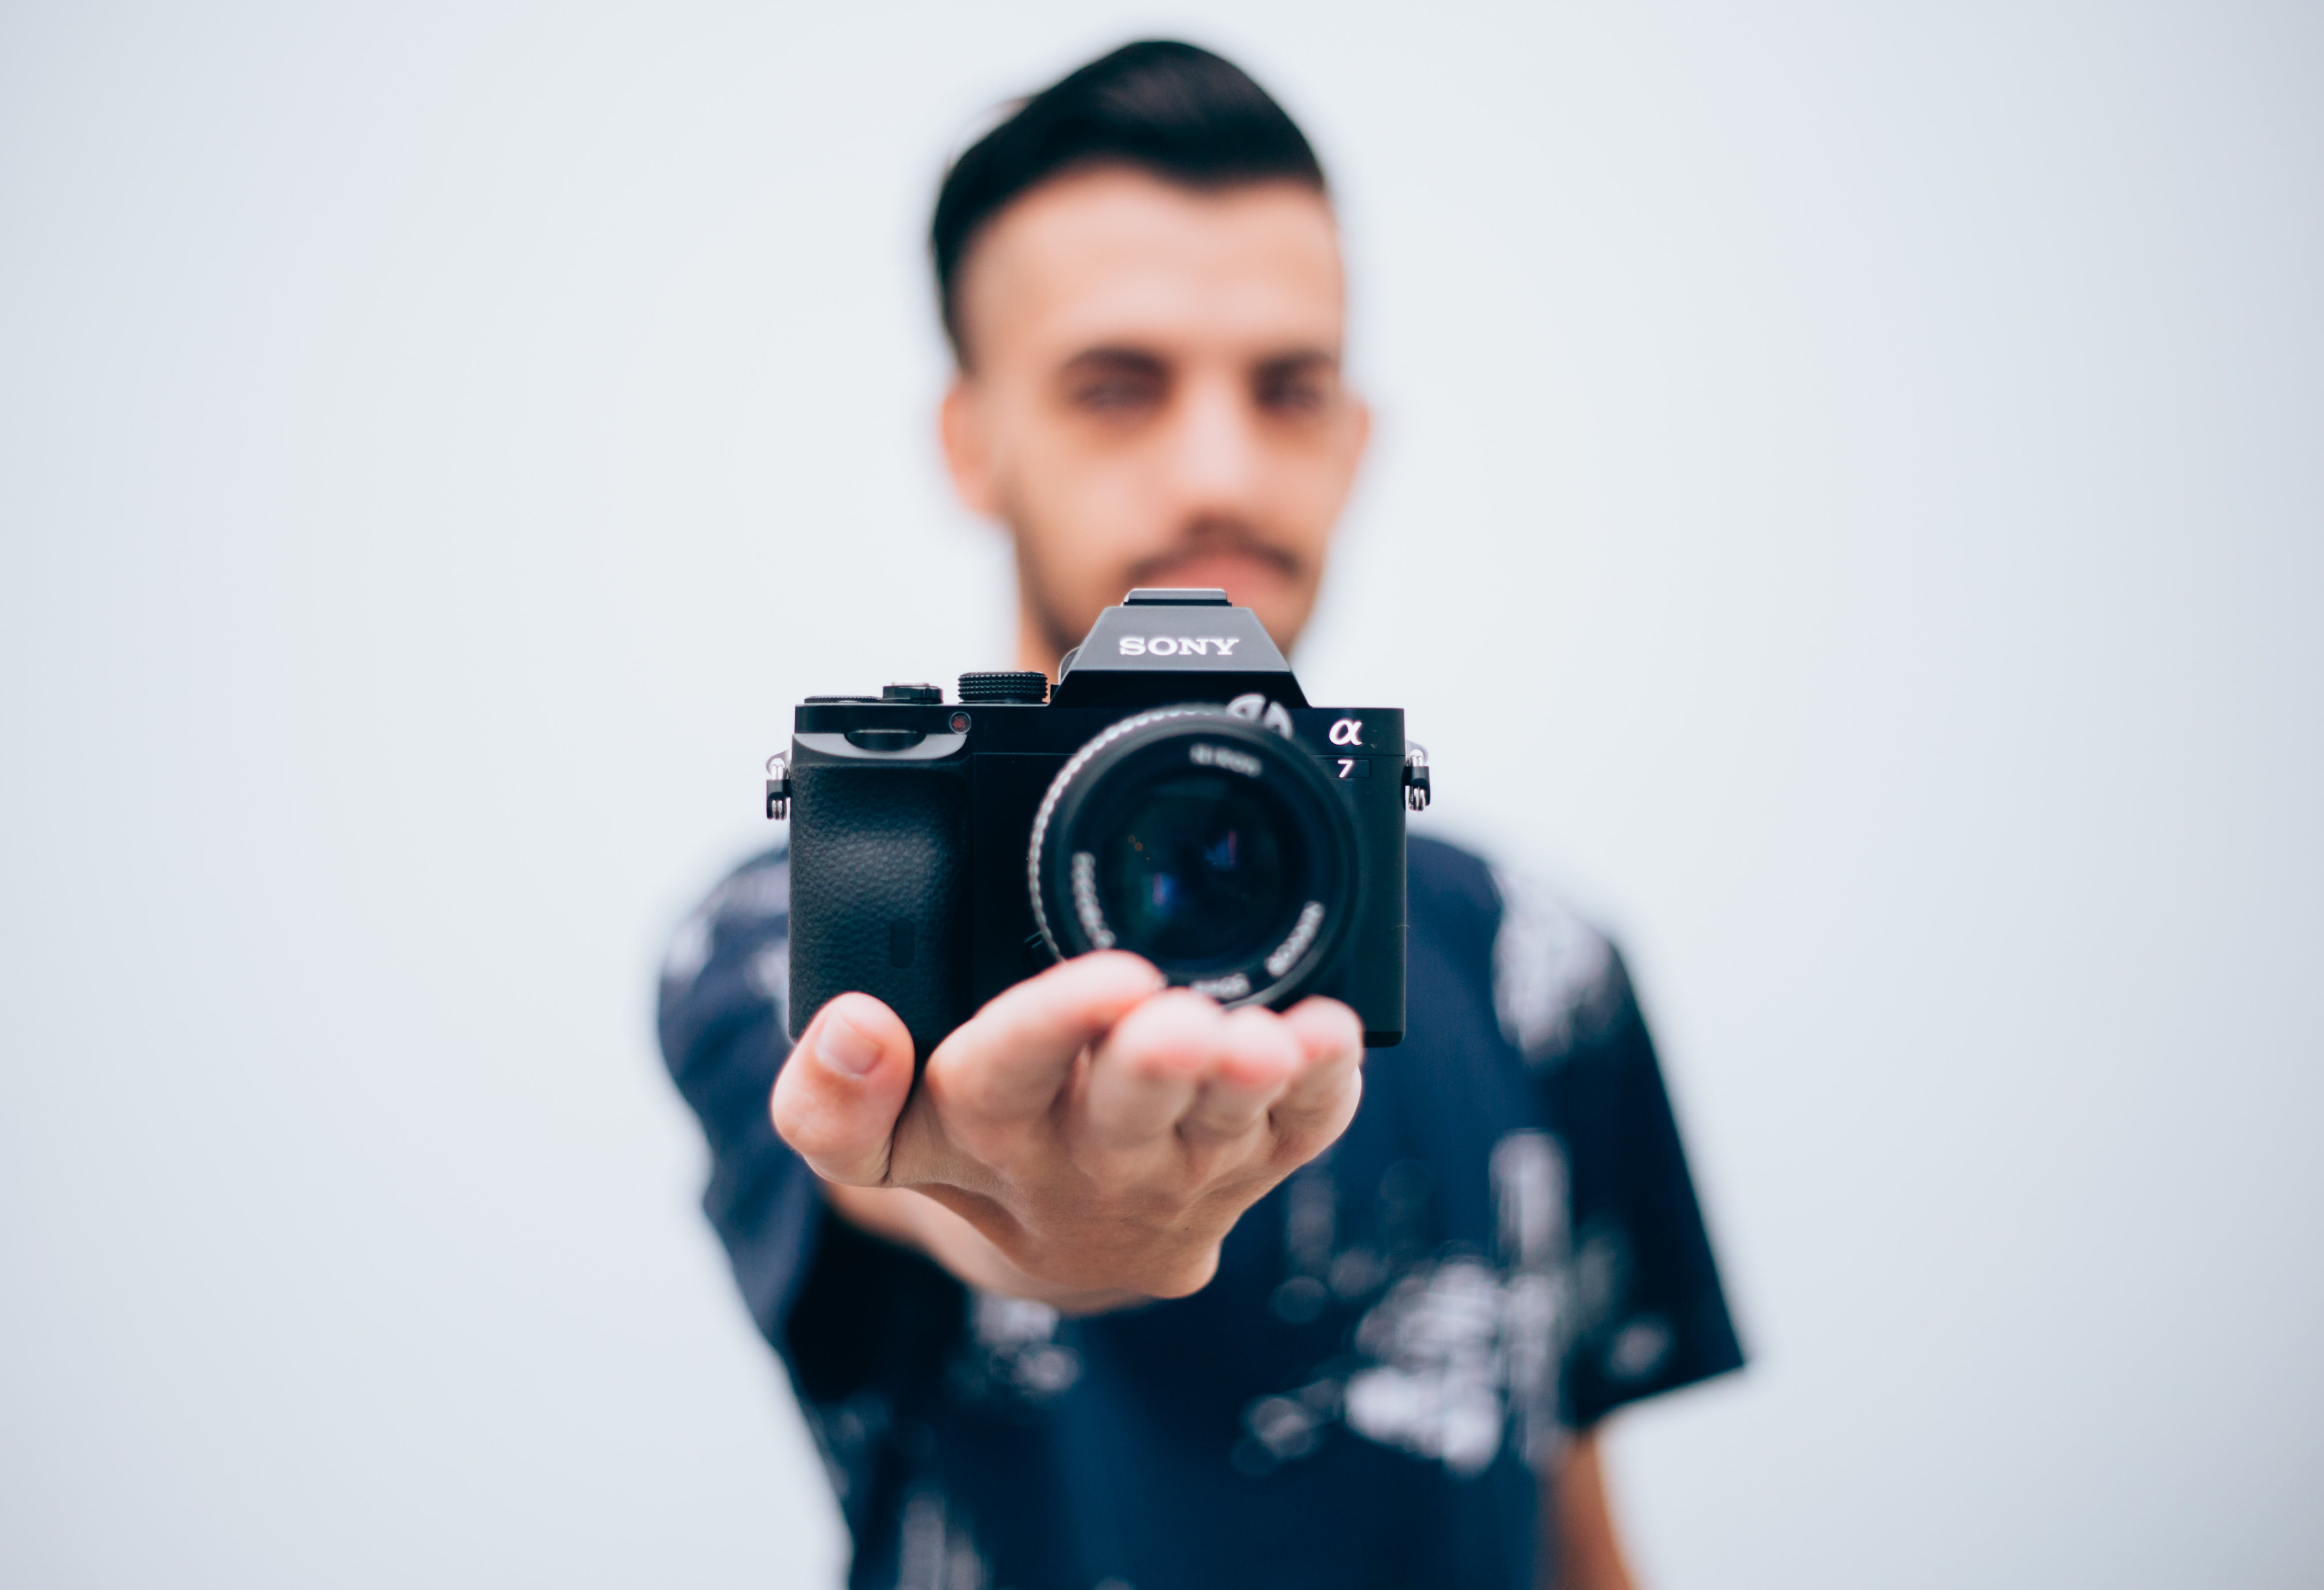 Kostenloses Stock Foto zu fotograf, fotografie, hobby, kamera